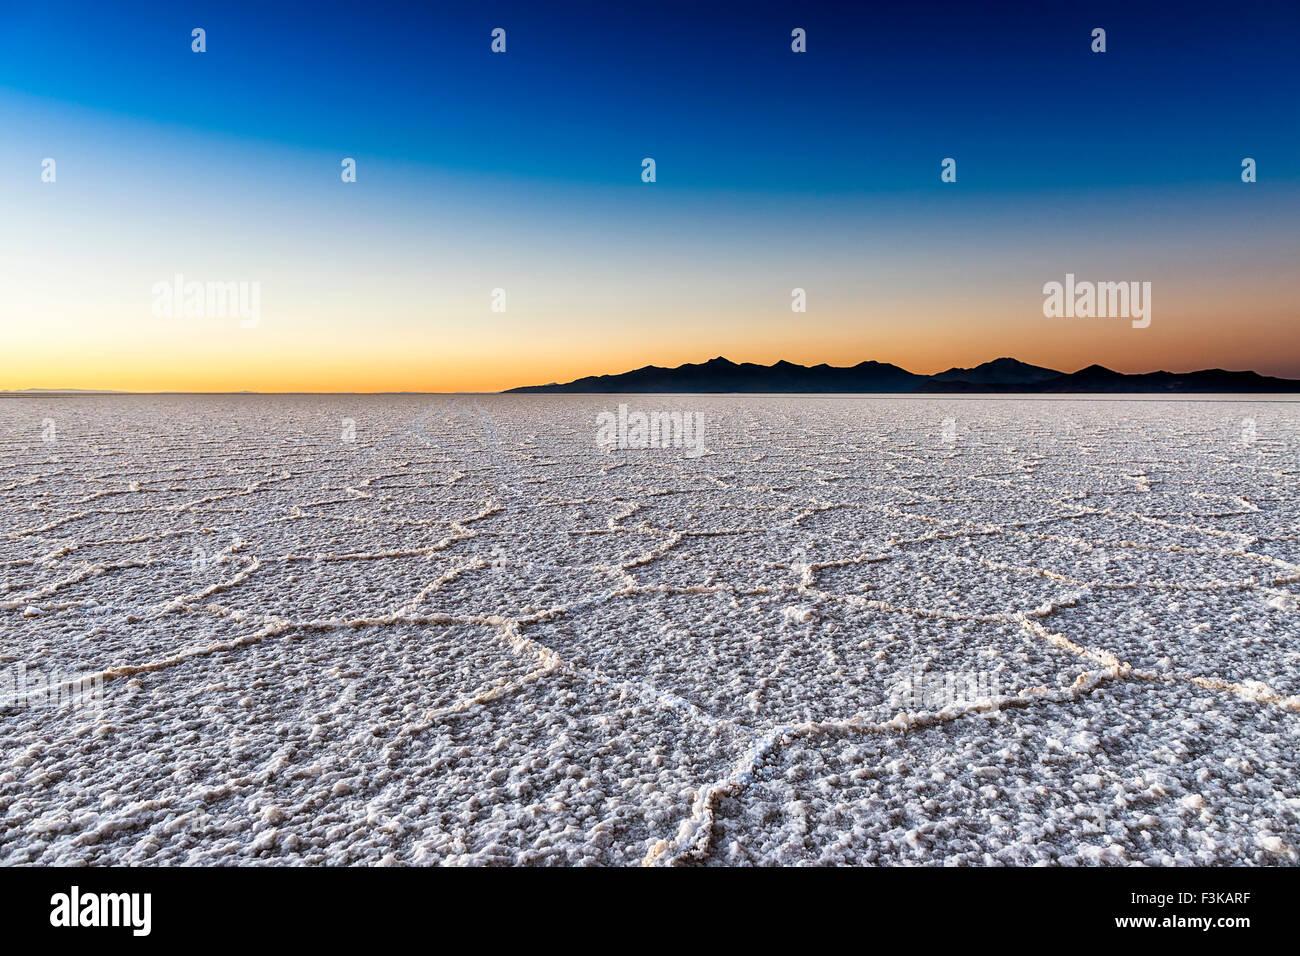 Lever du soleil dans le Salar de Uyuni, Bolivie Photo Stock